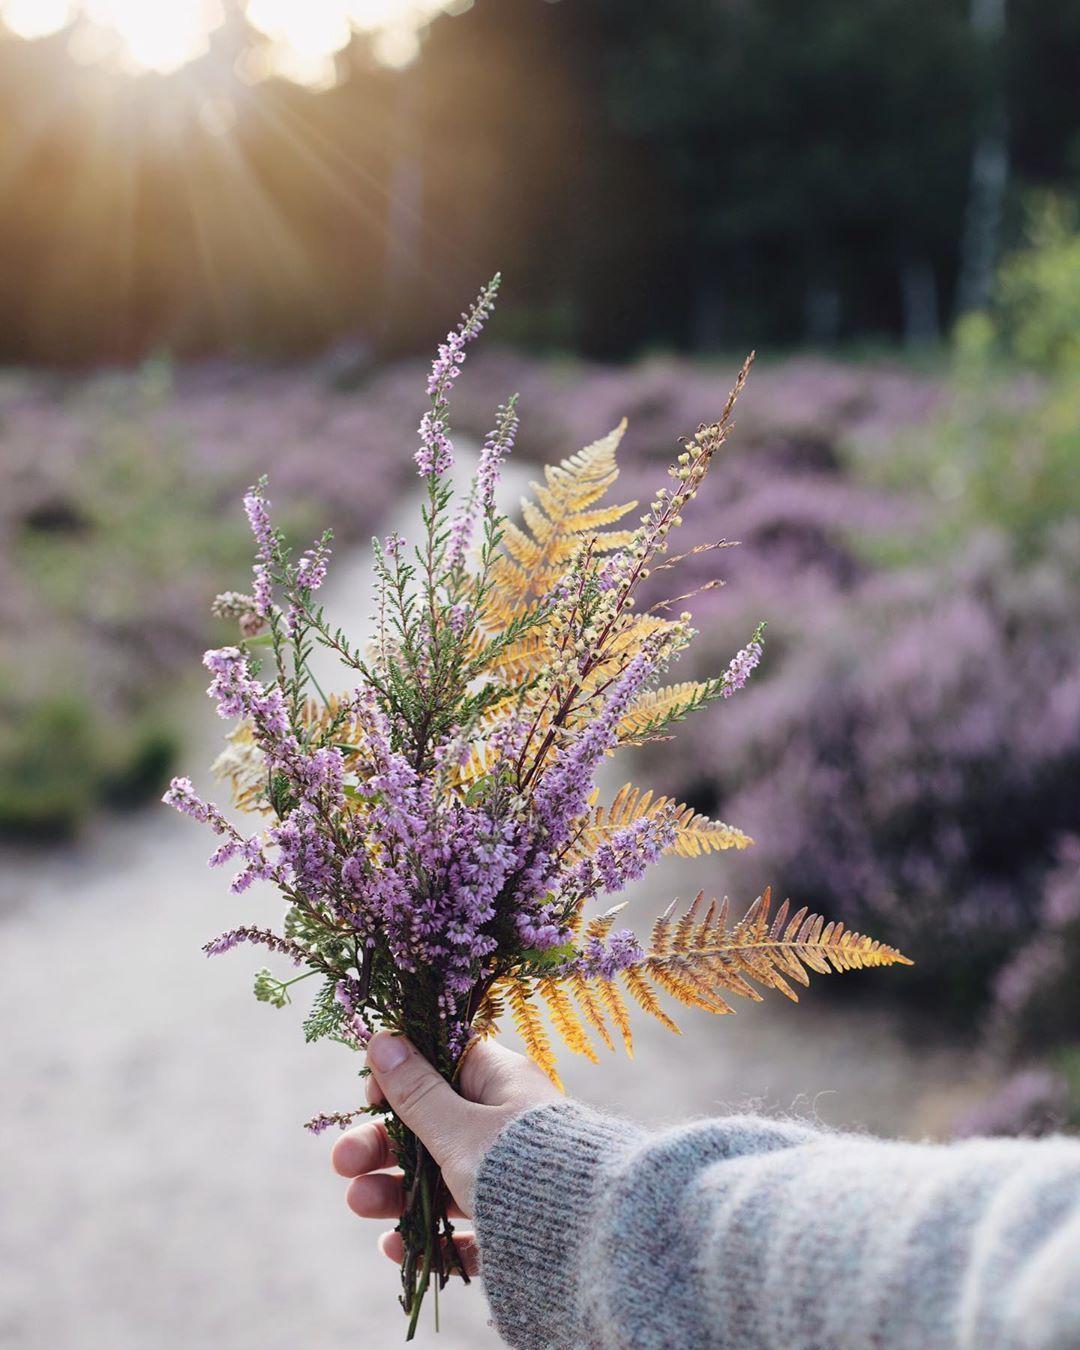 Janne On Instagram England Summer Wildflowers Foraging Bouquet Flower Aesthetic Pretty Flowers Botanical Illustration Vintage